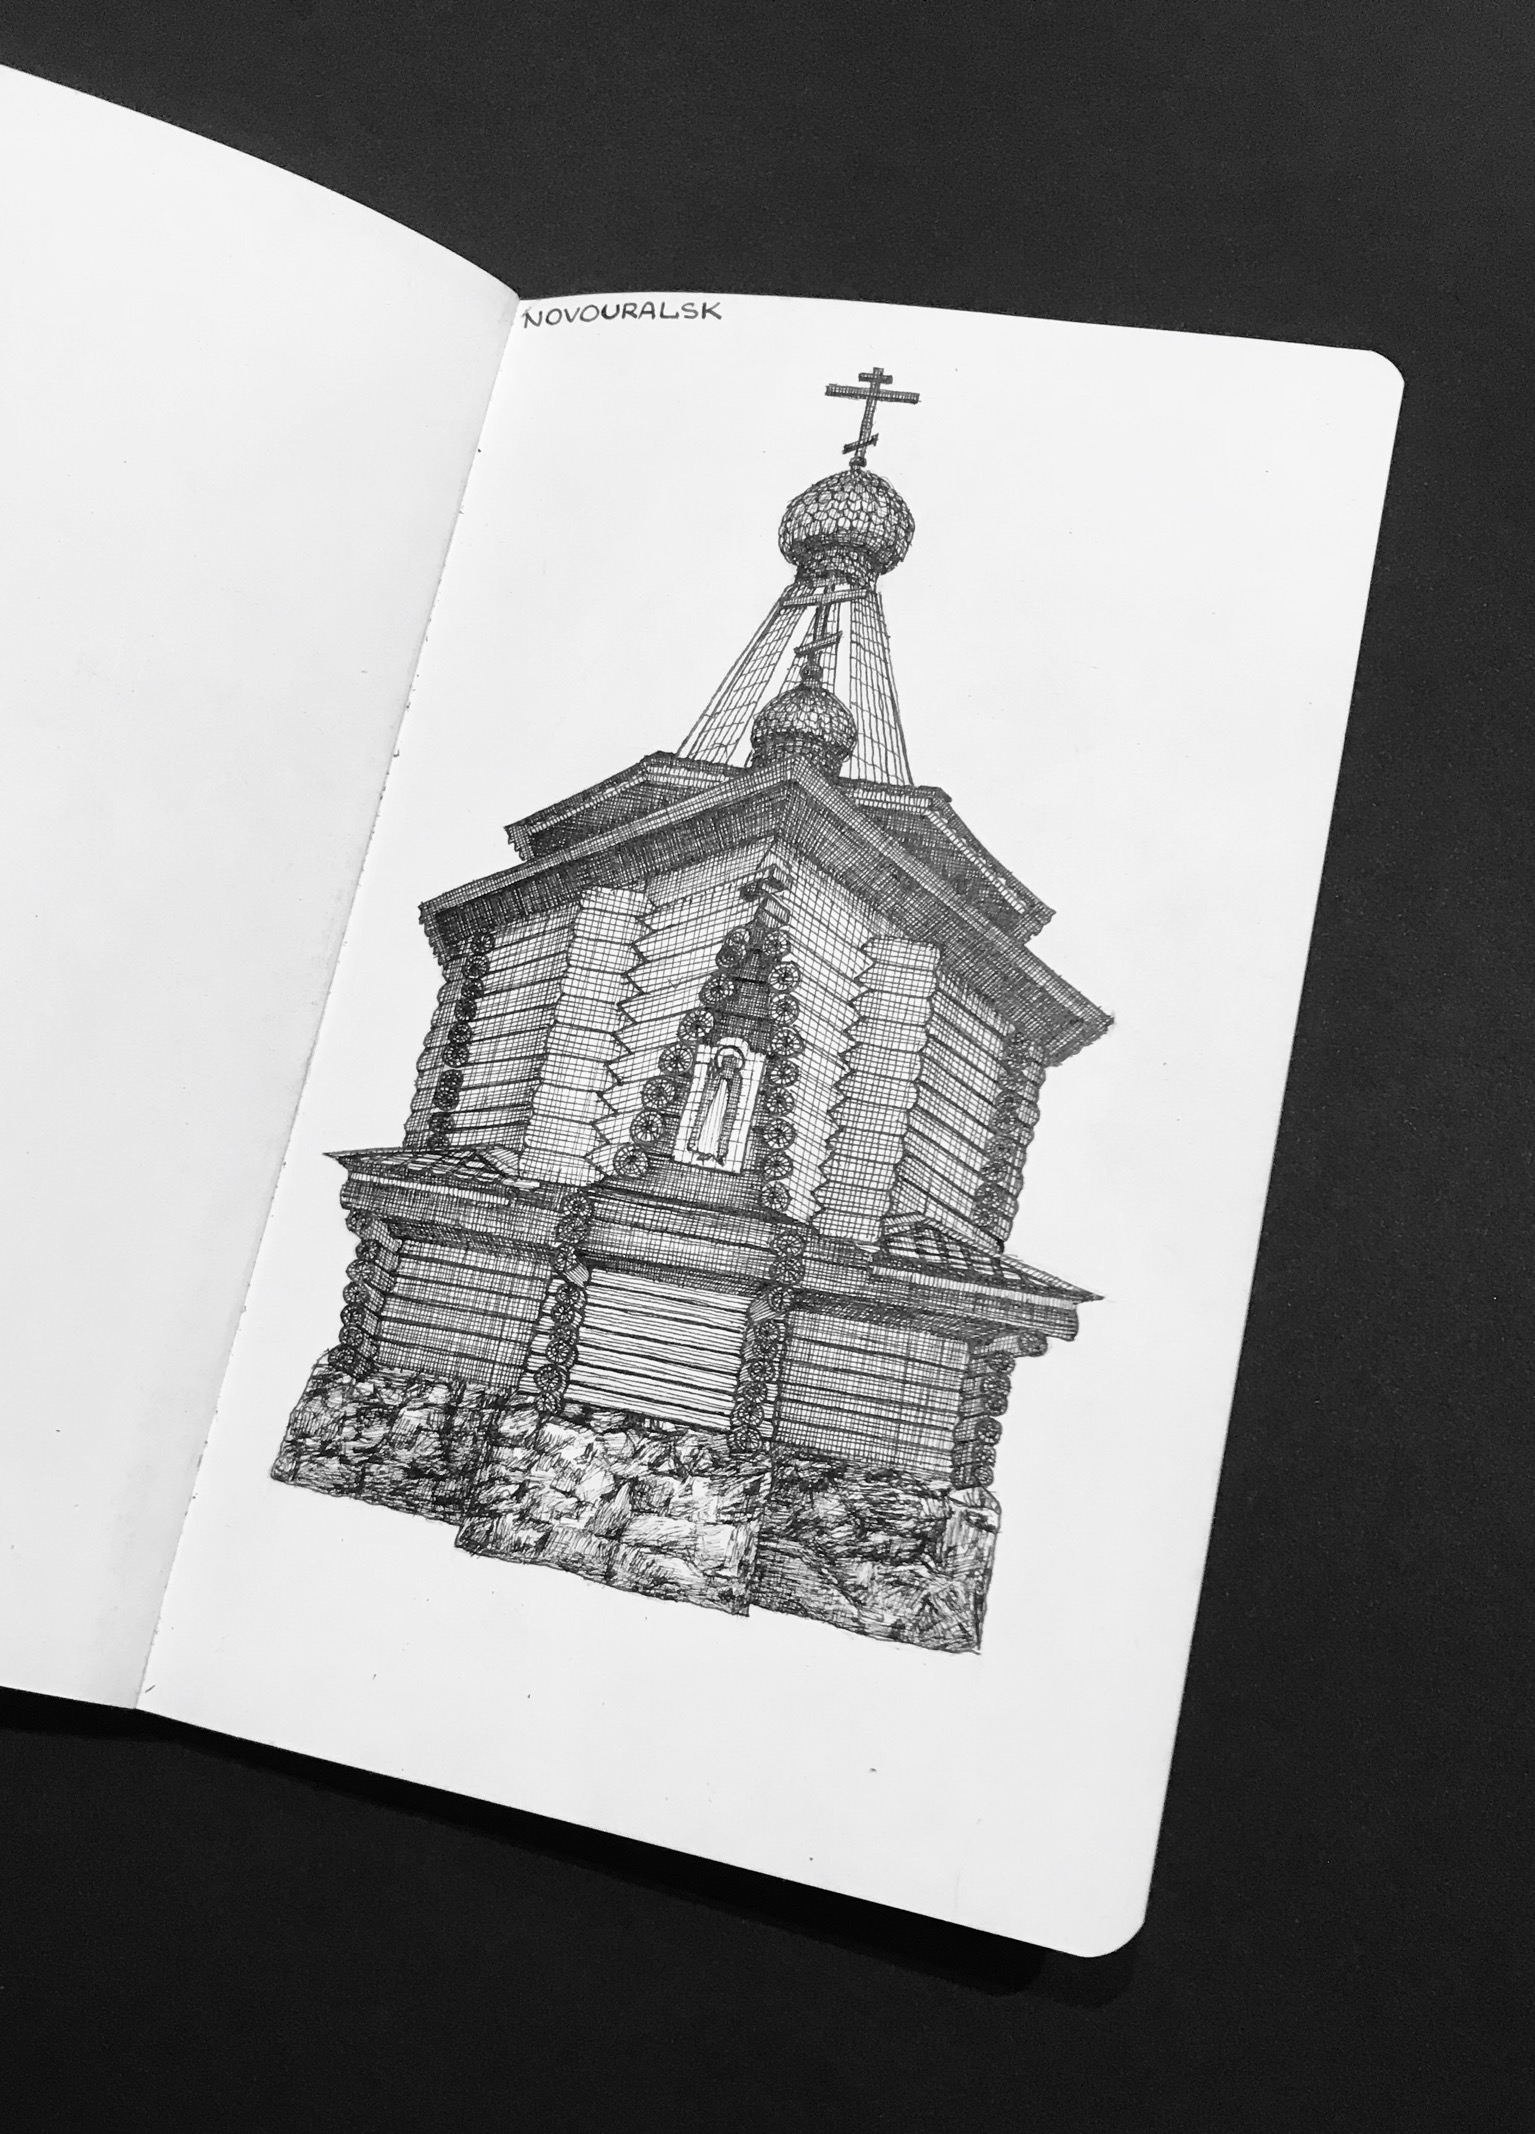 18th century wooden church